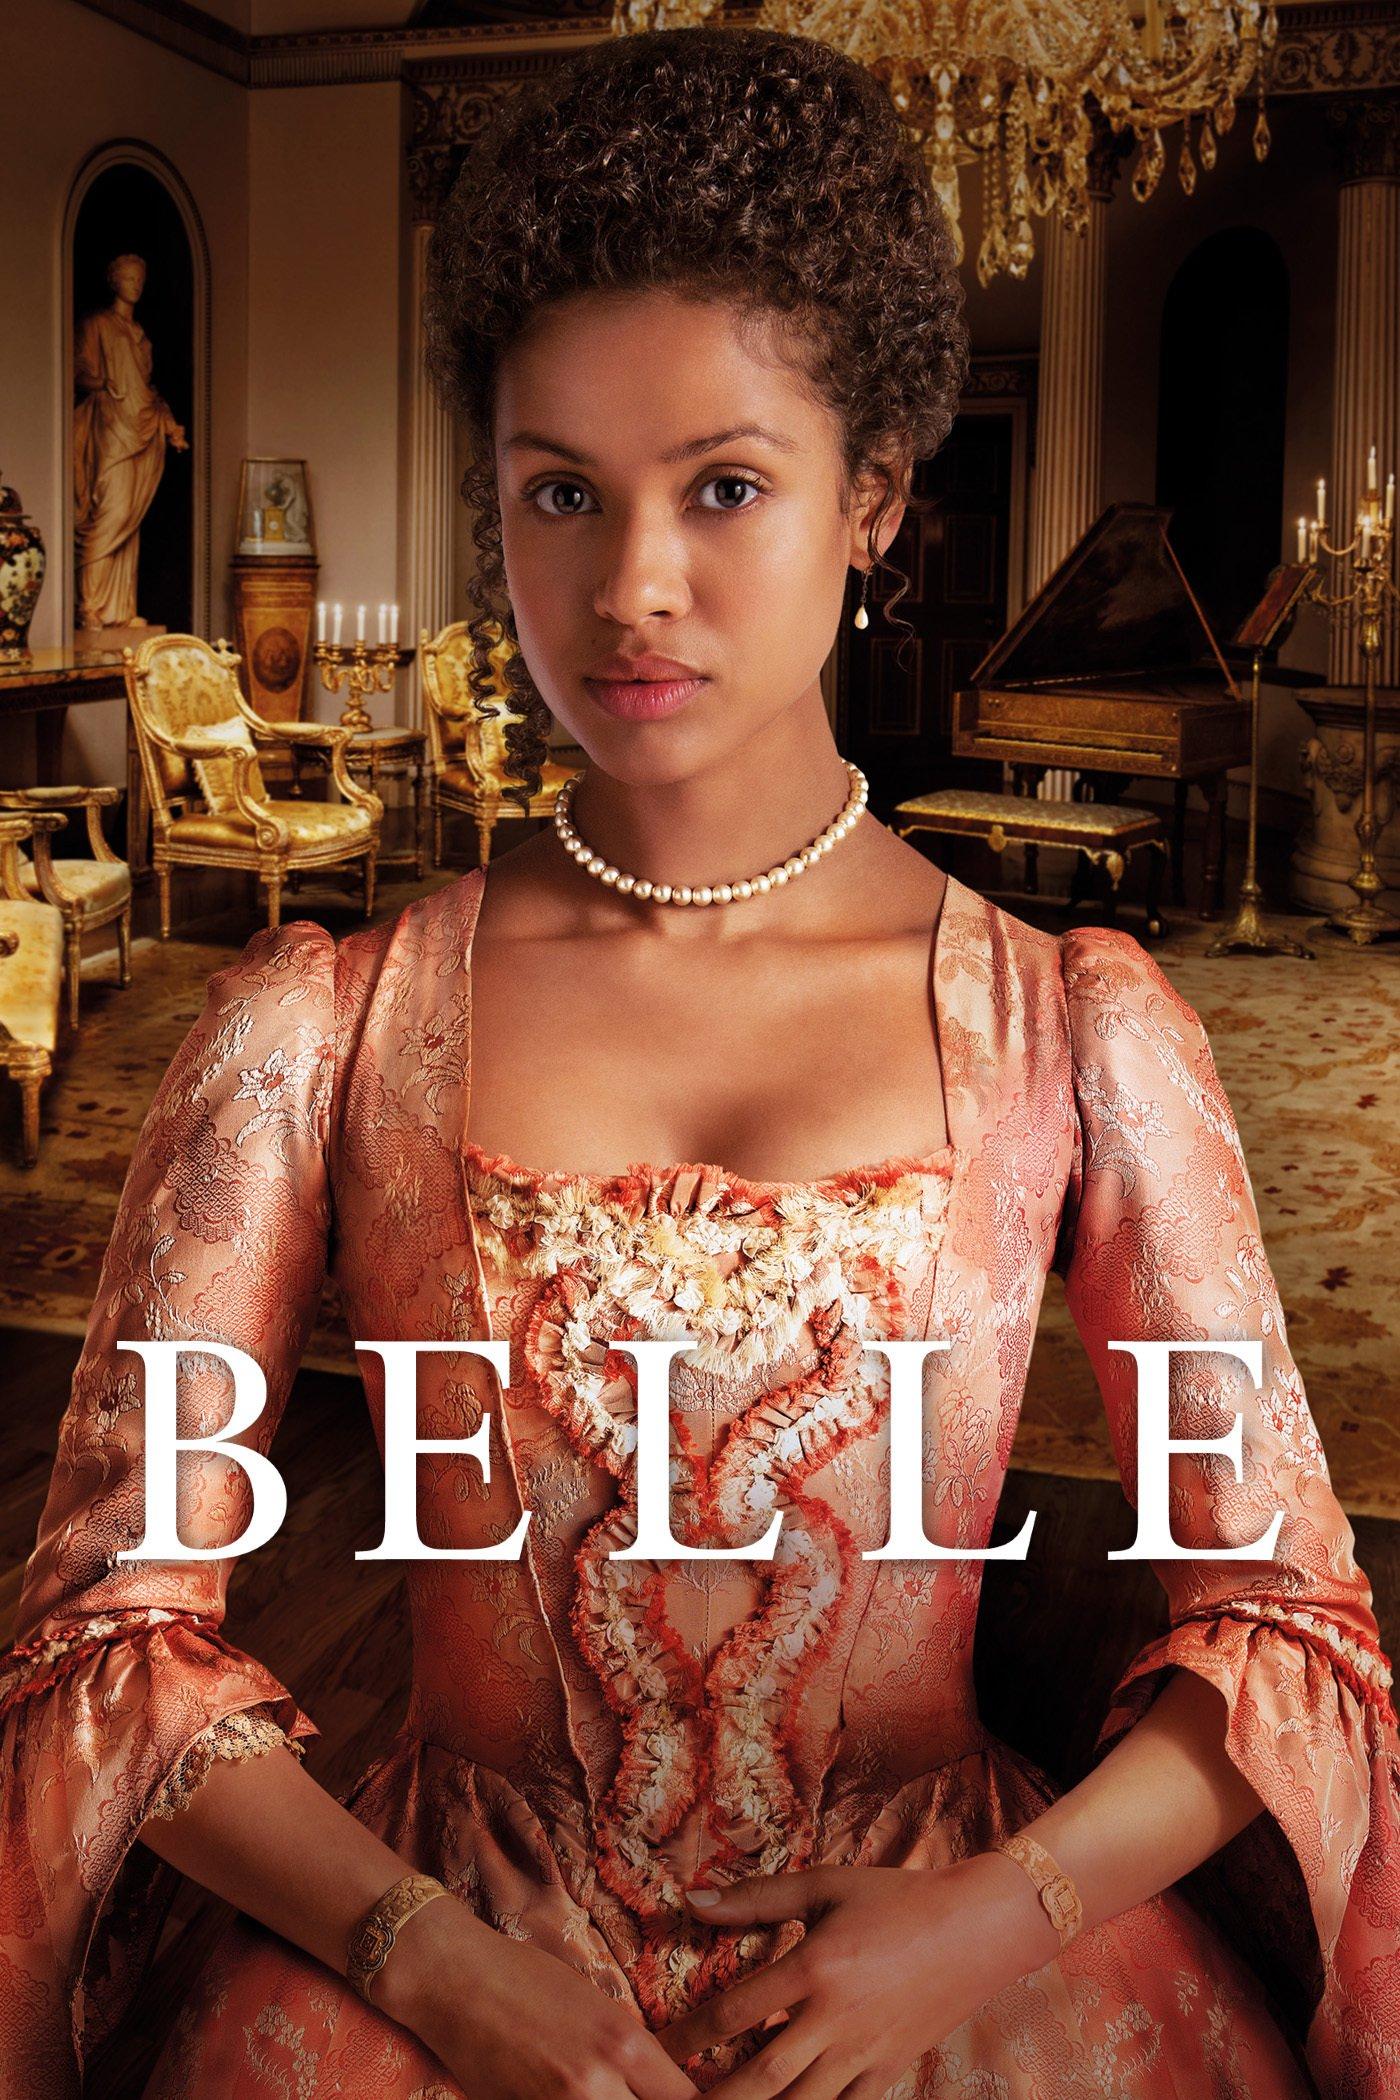 Bella movie open